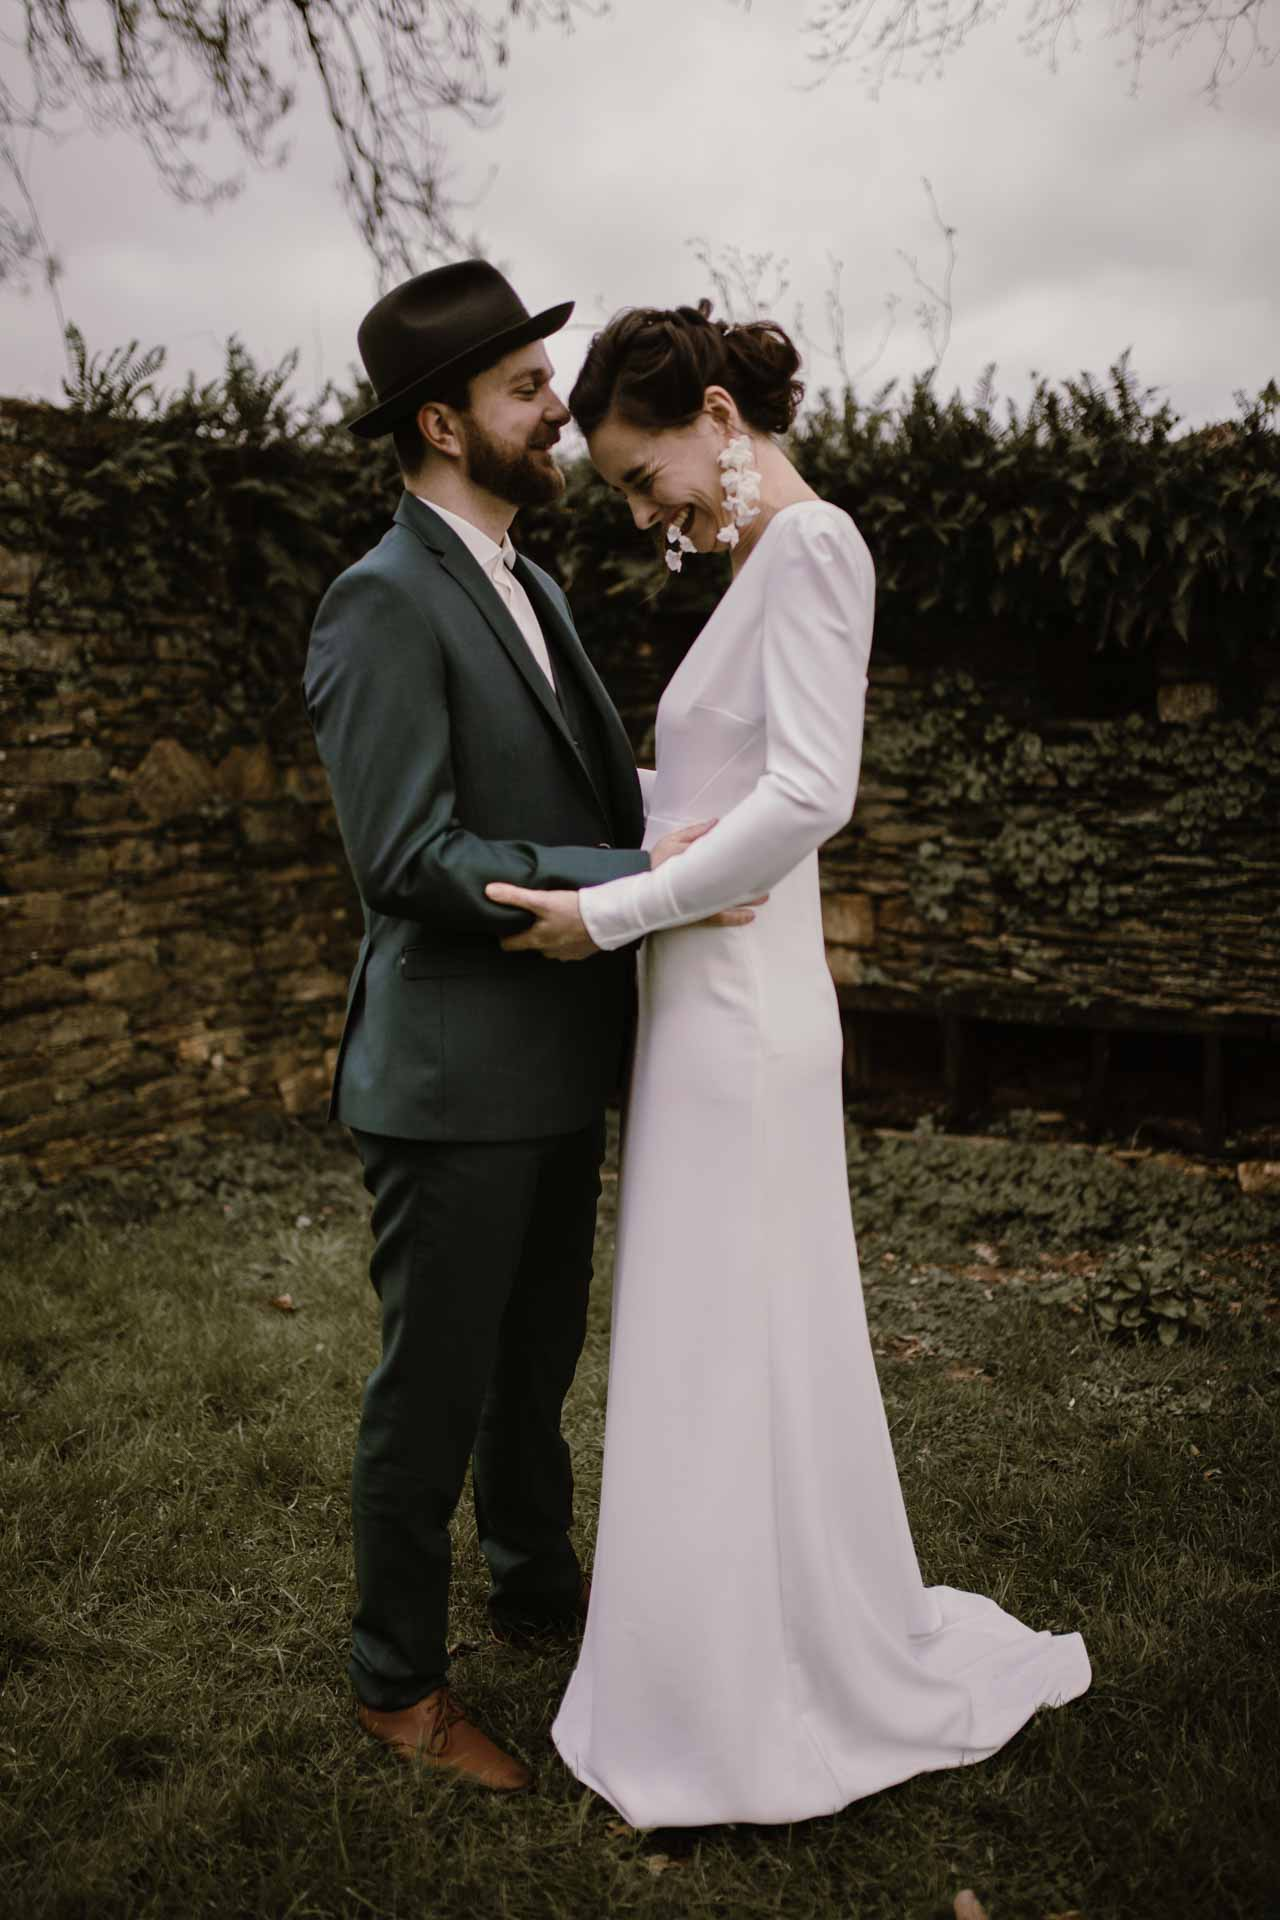 mariage costume du marie robe de mariee